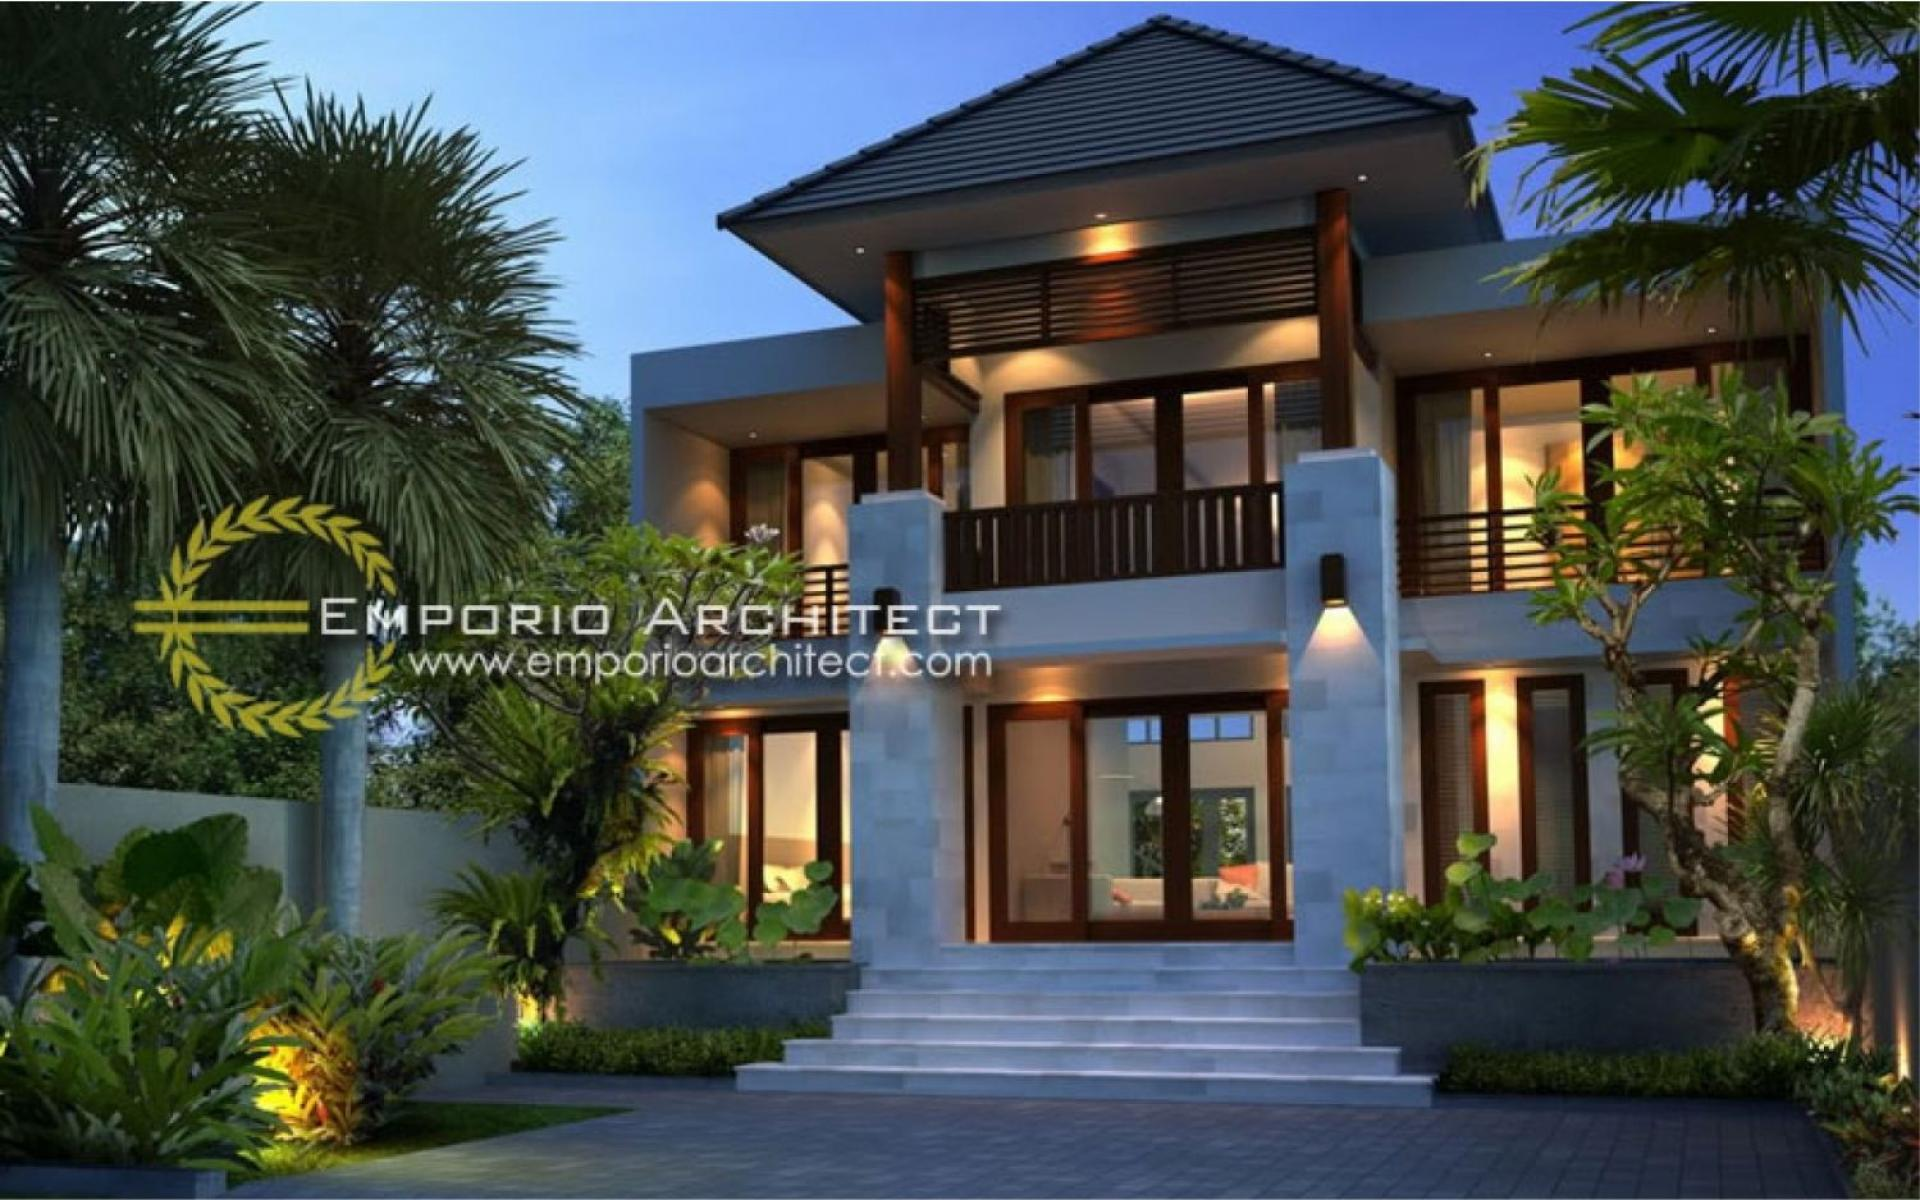 Mr. Artana Villa Bali House 2 Floors Design - Denpasar, Bali